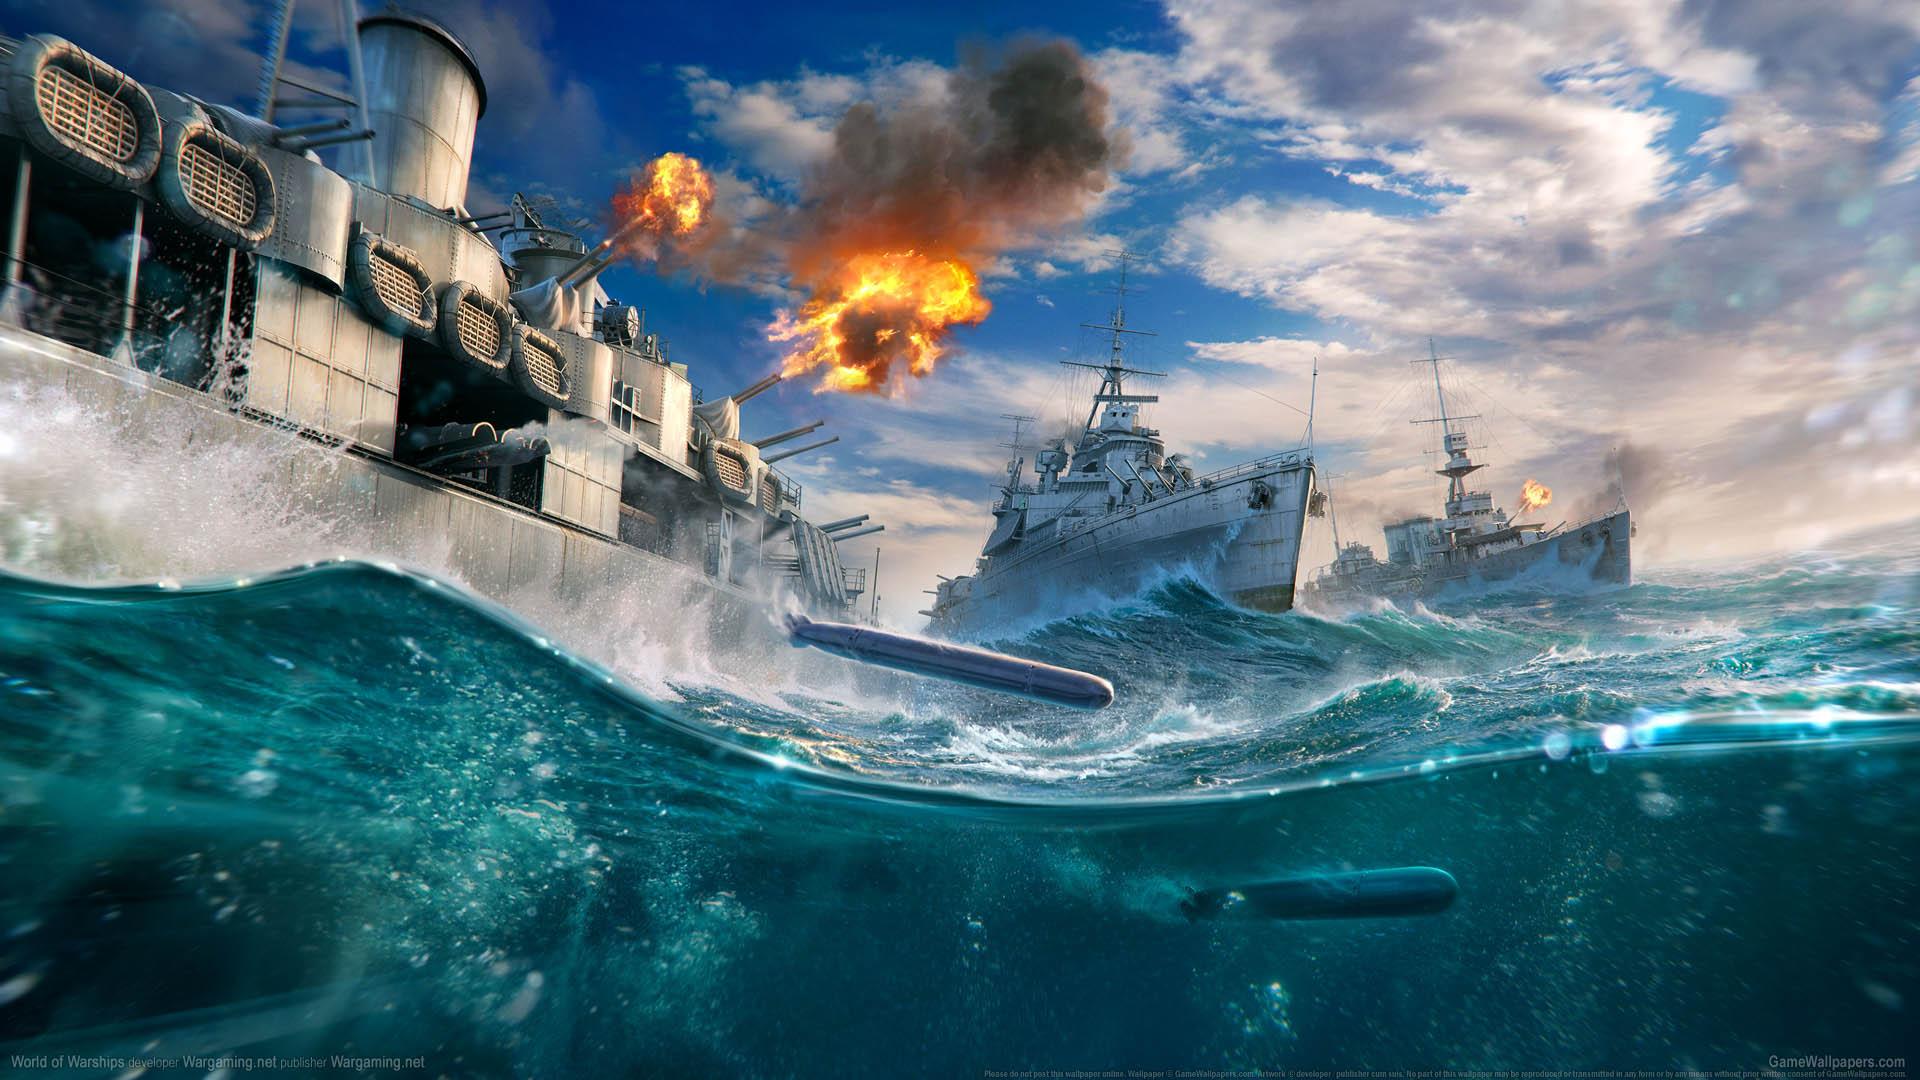 World of Warships fond d'écran 15 1920x1080